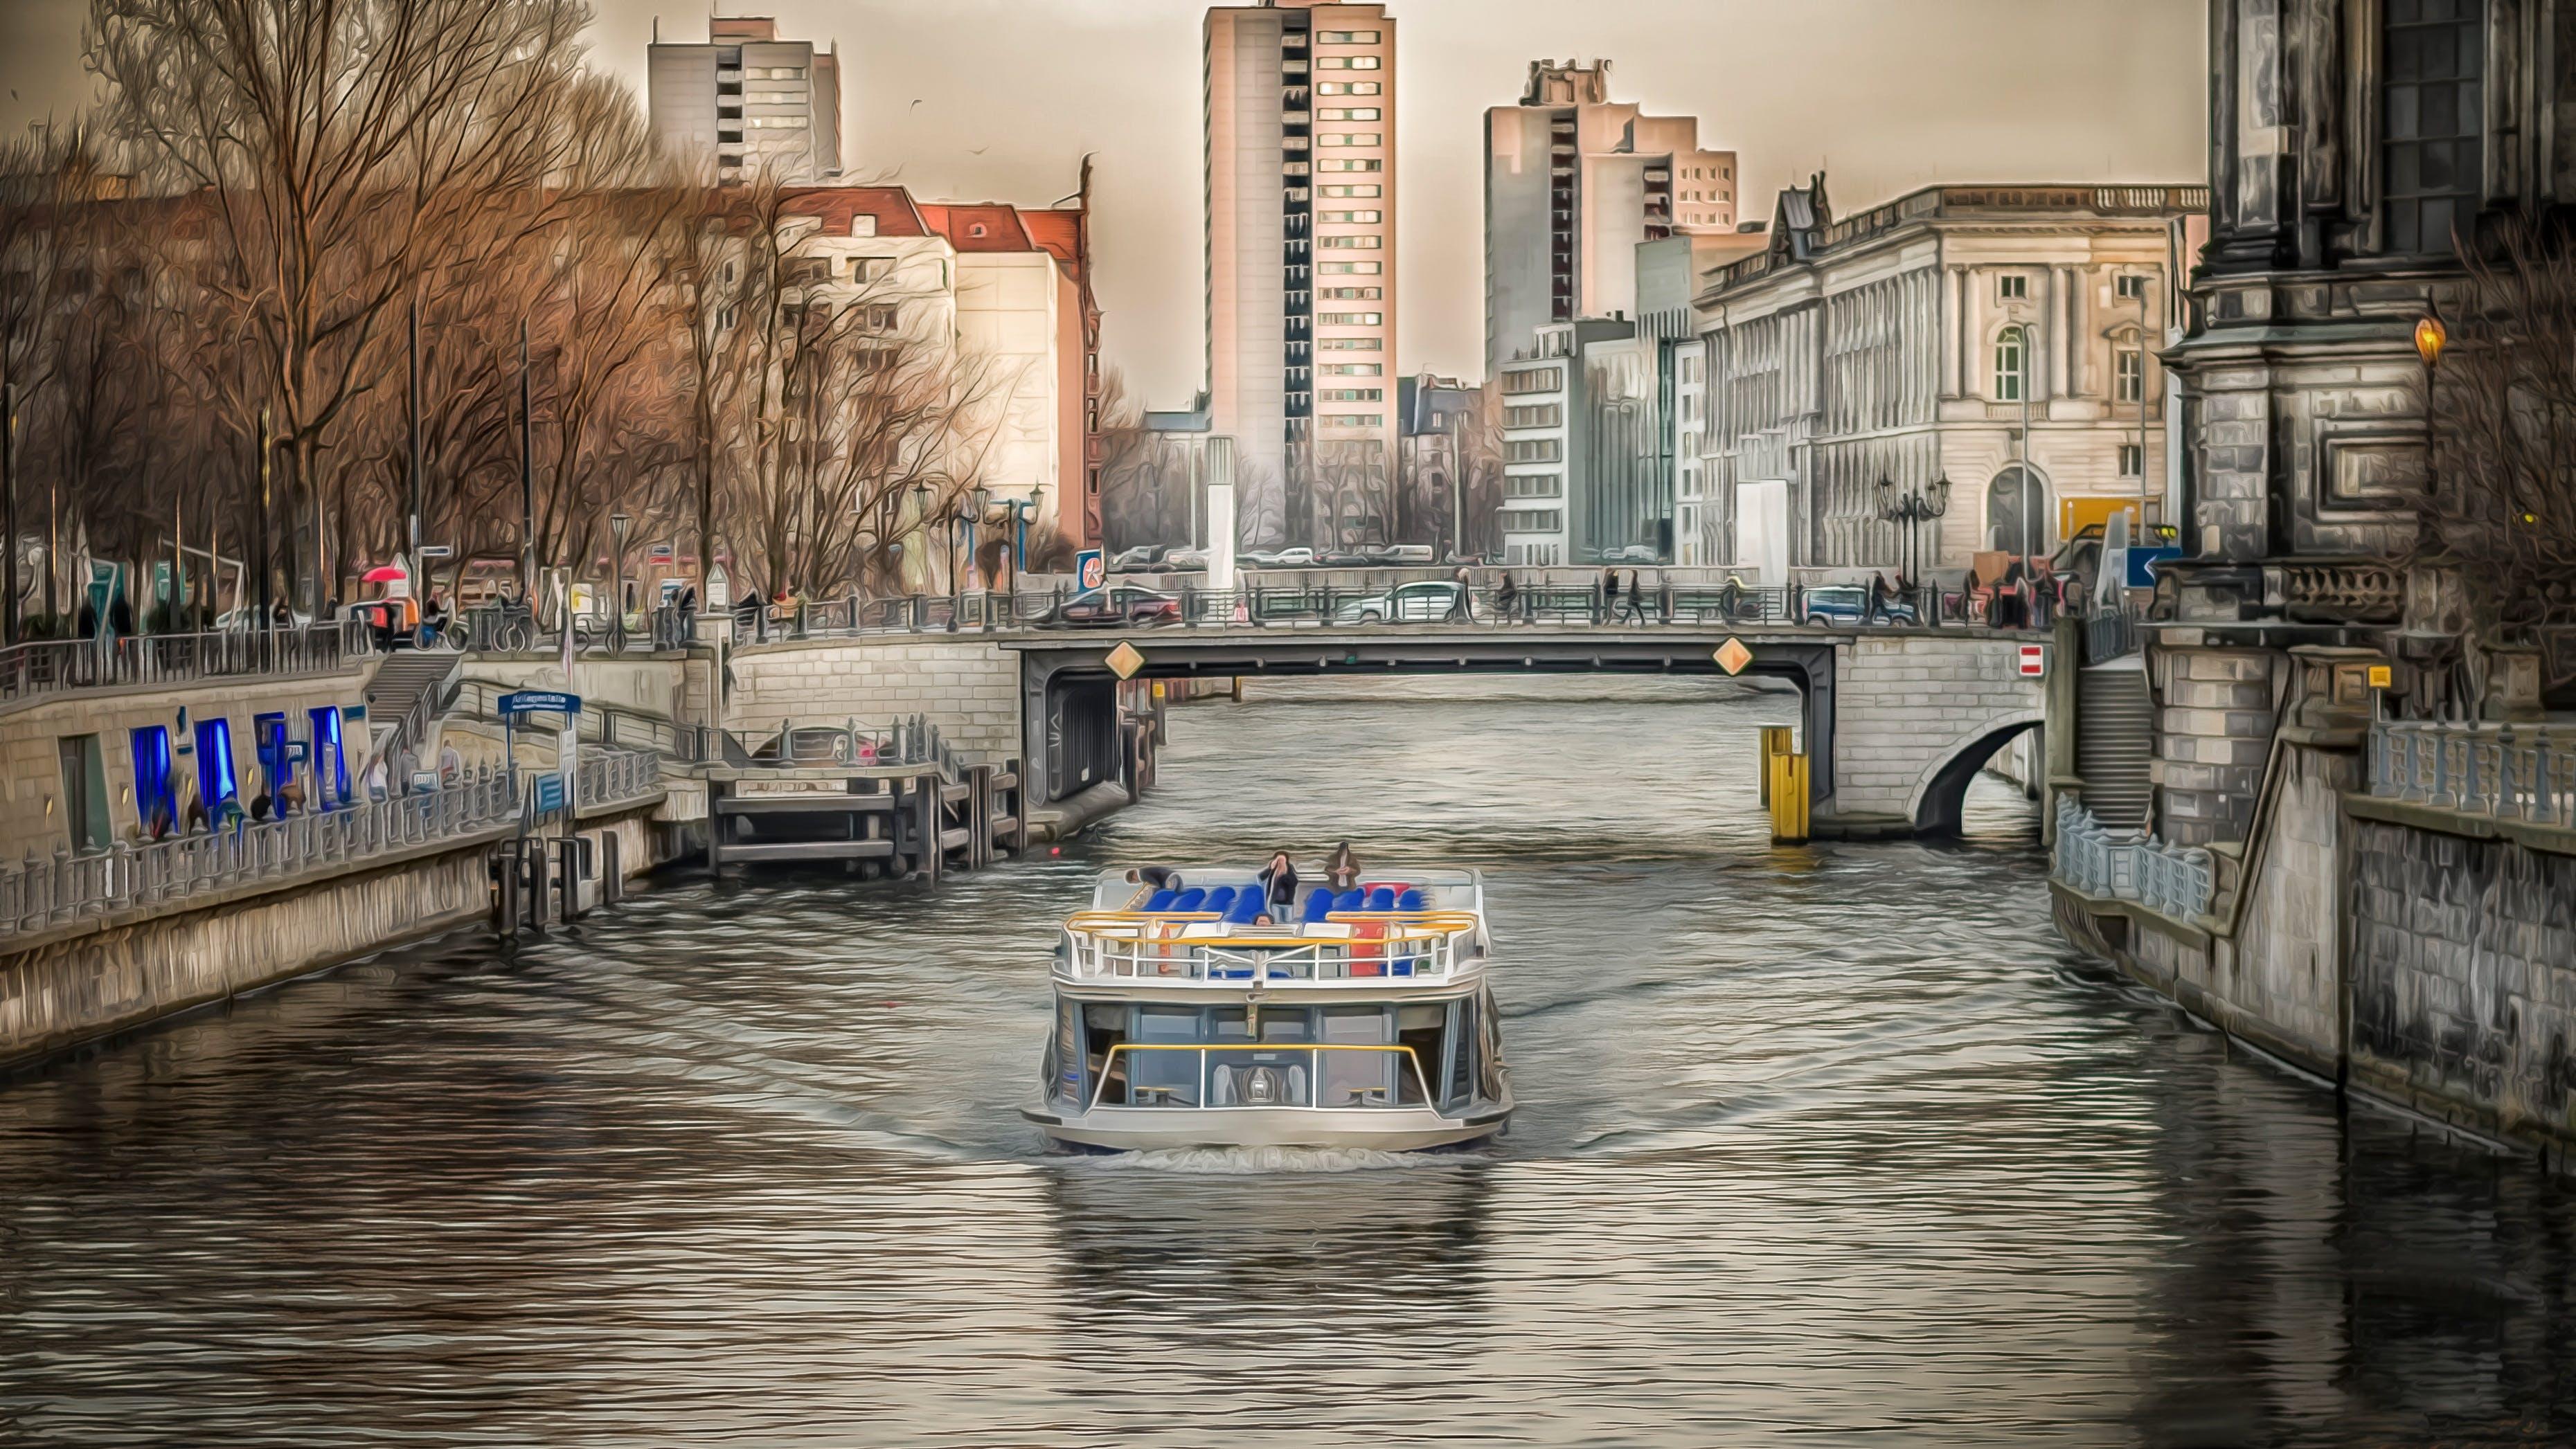 White Powerboat Under Gray Bridge